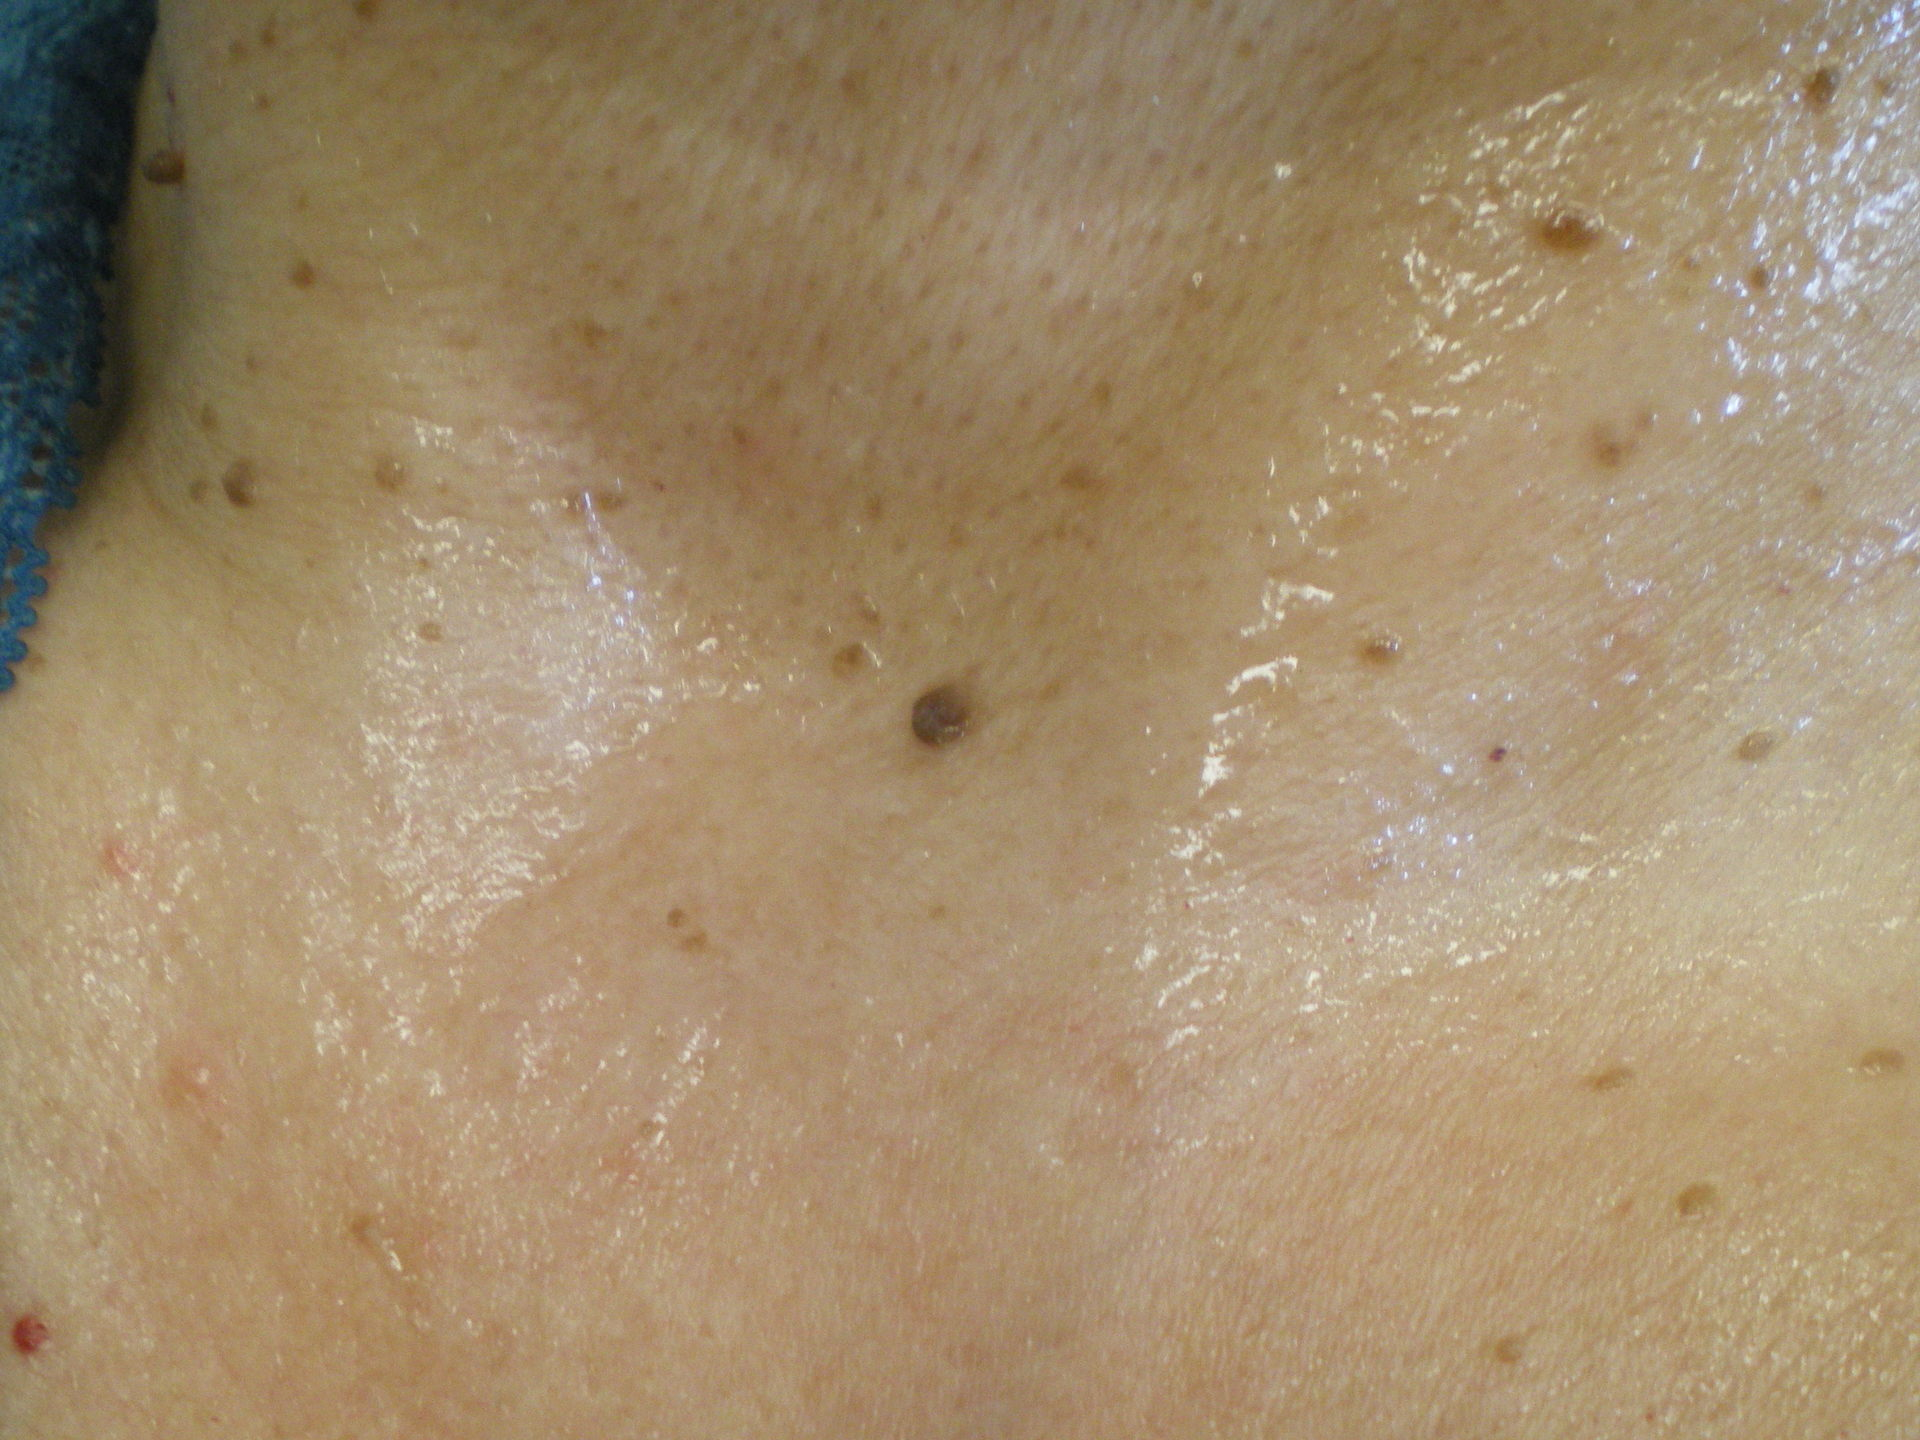 Dark imperfections on neck